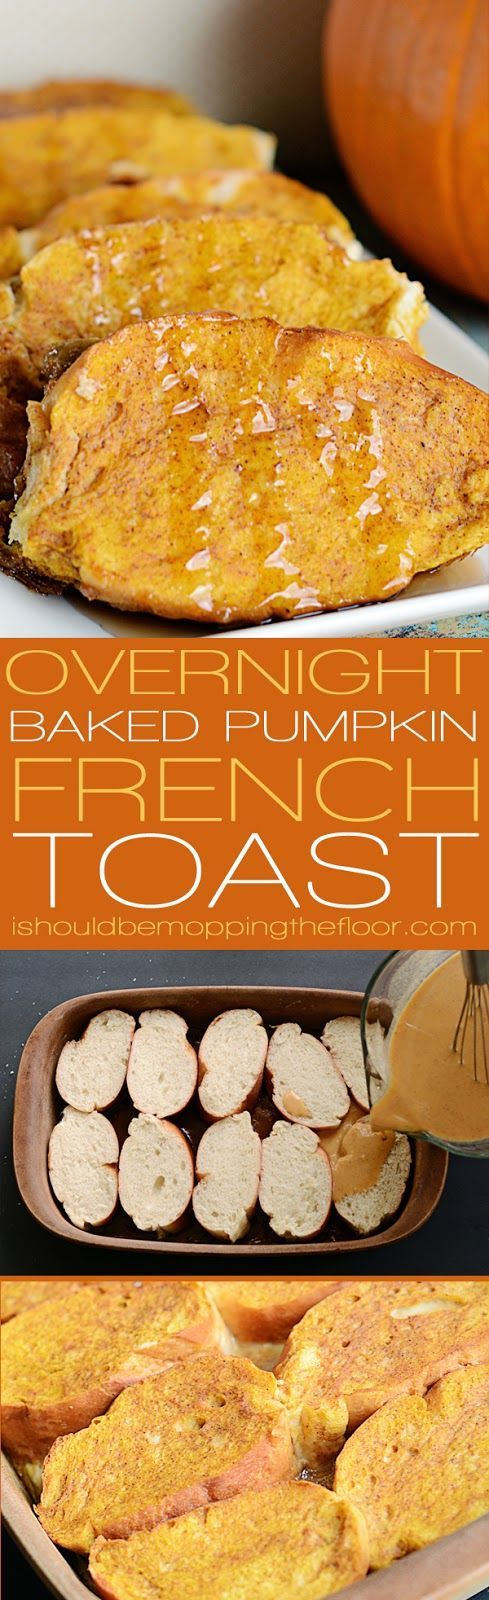 Overnight Baked Pumpkin French Toast